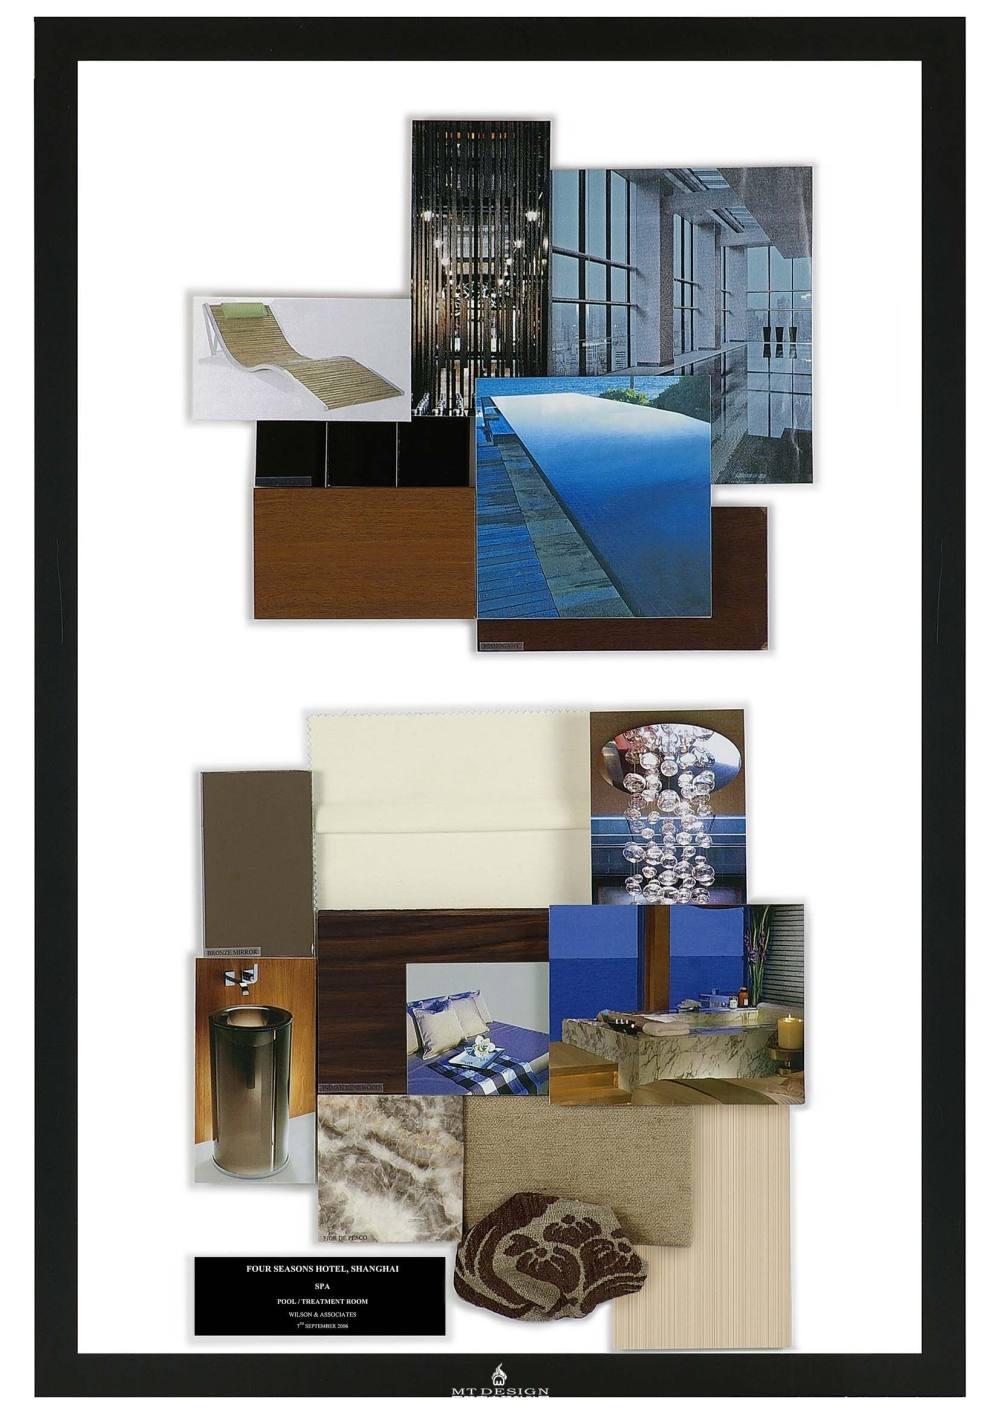 Wilson&Associates--上海浦东四季酒店全套施工图2008_06.09.19 Spa Pool.jpg